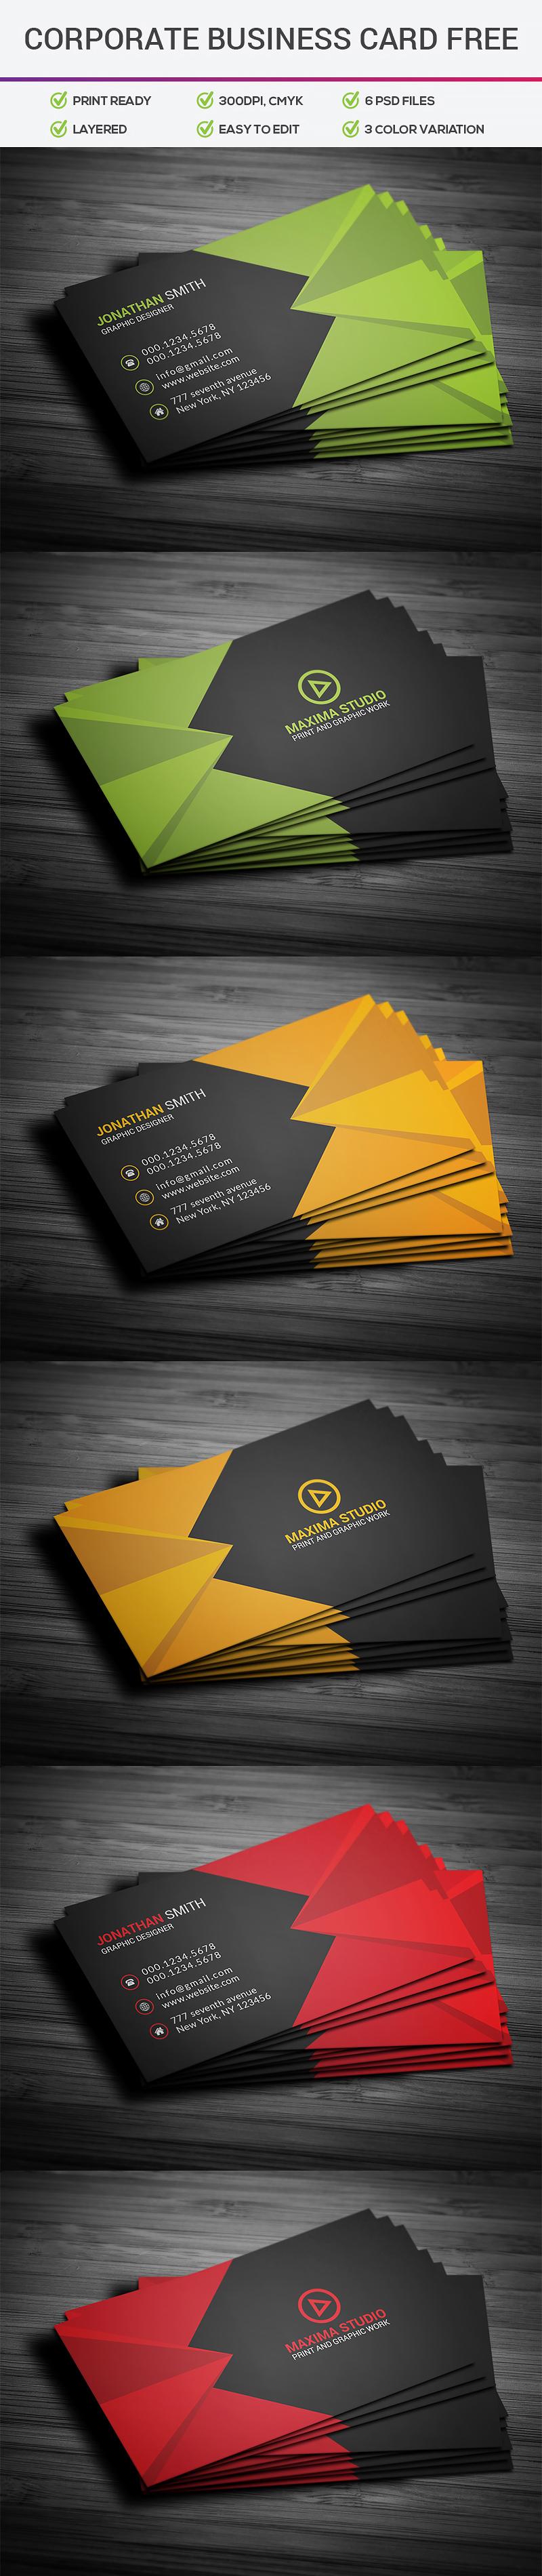 p323 - لایه باز کارت ویزیت تجاری اداری ساده و شیک